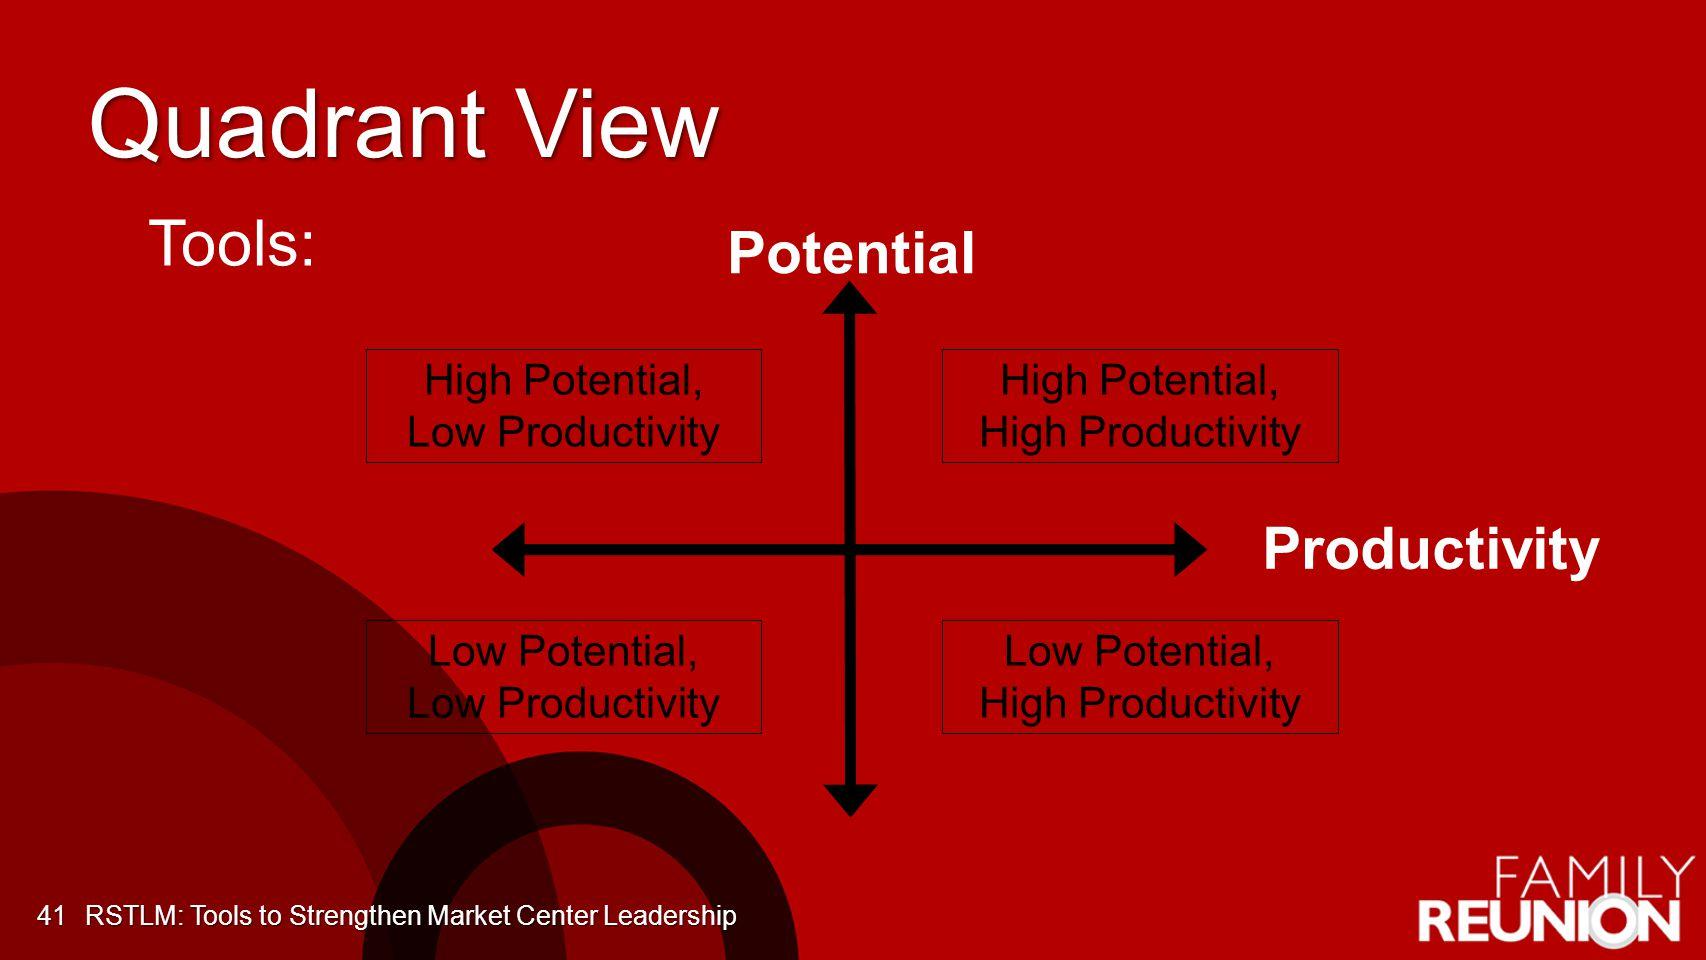 Quadrant View Potential Productivity High Potential, High Productivity